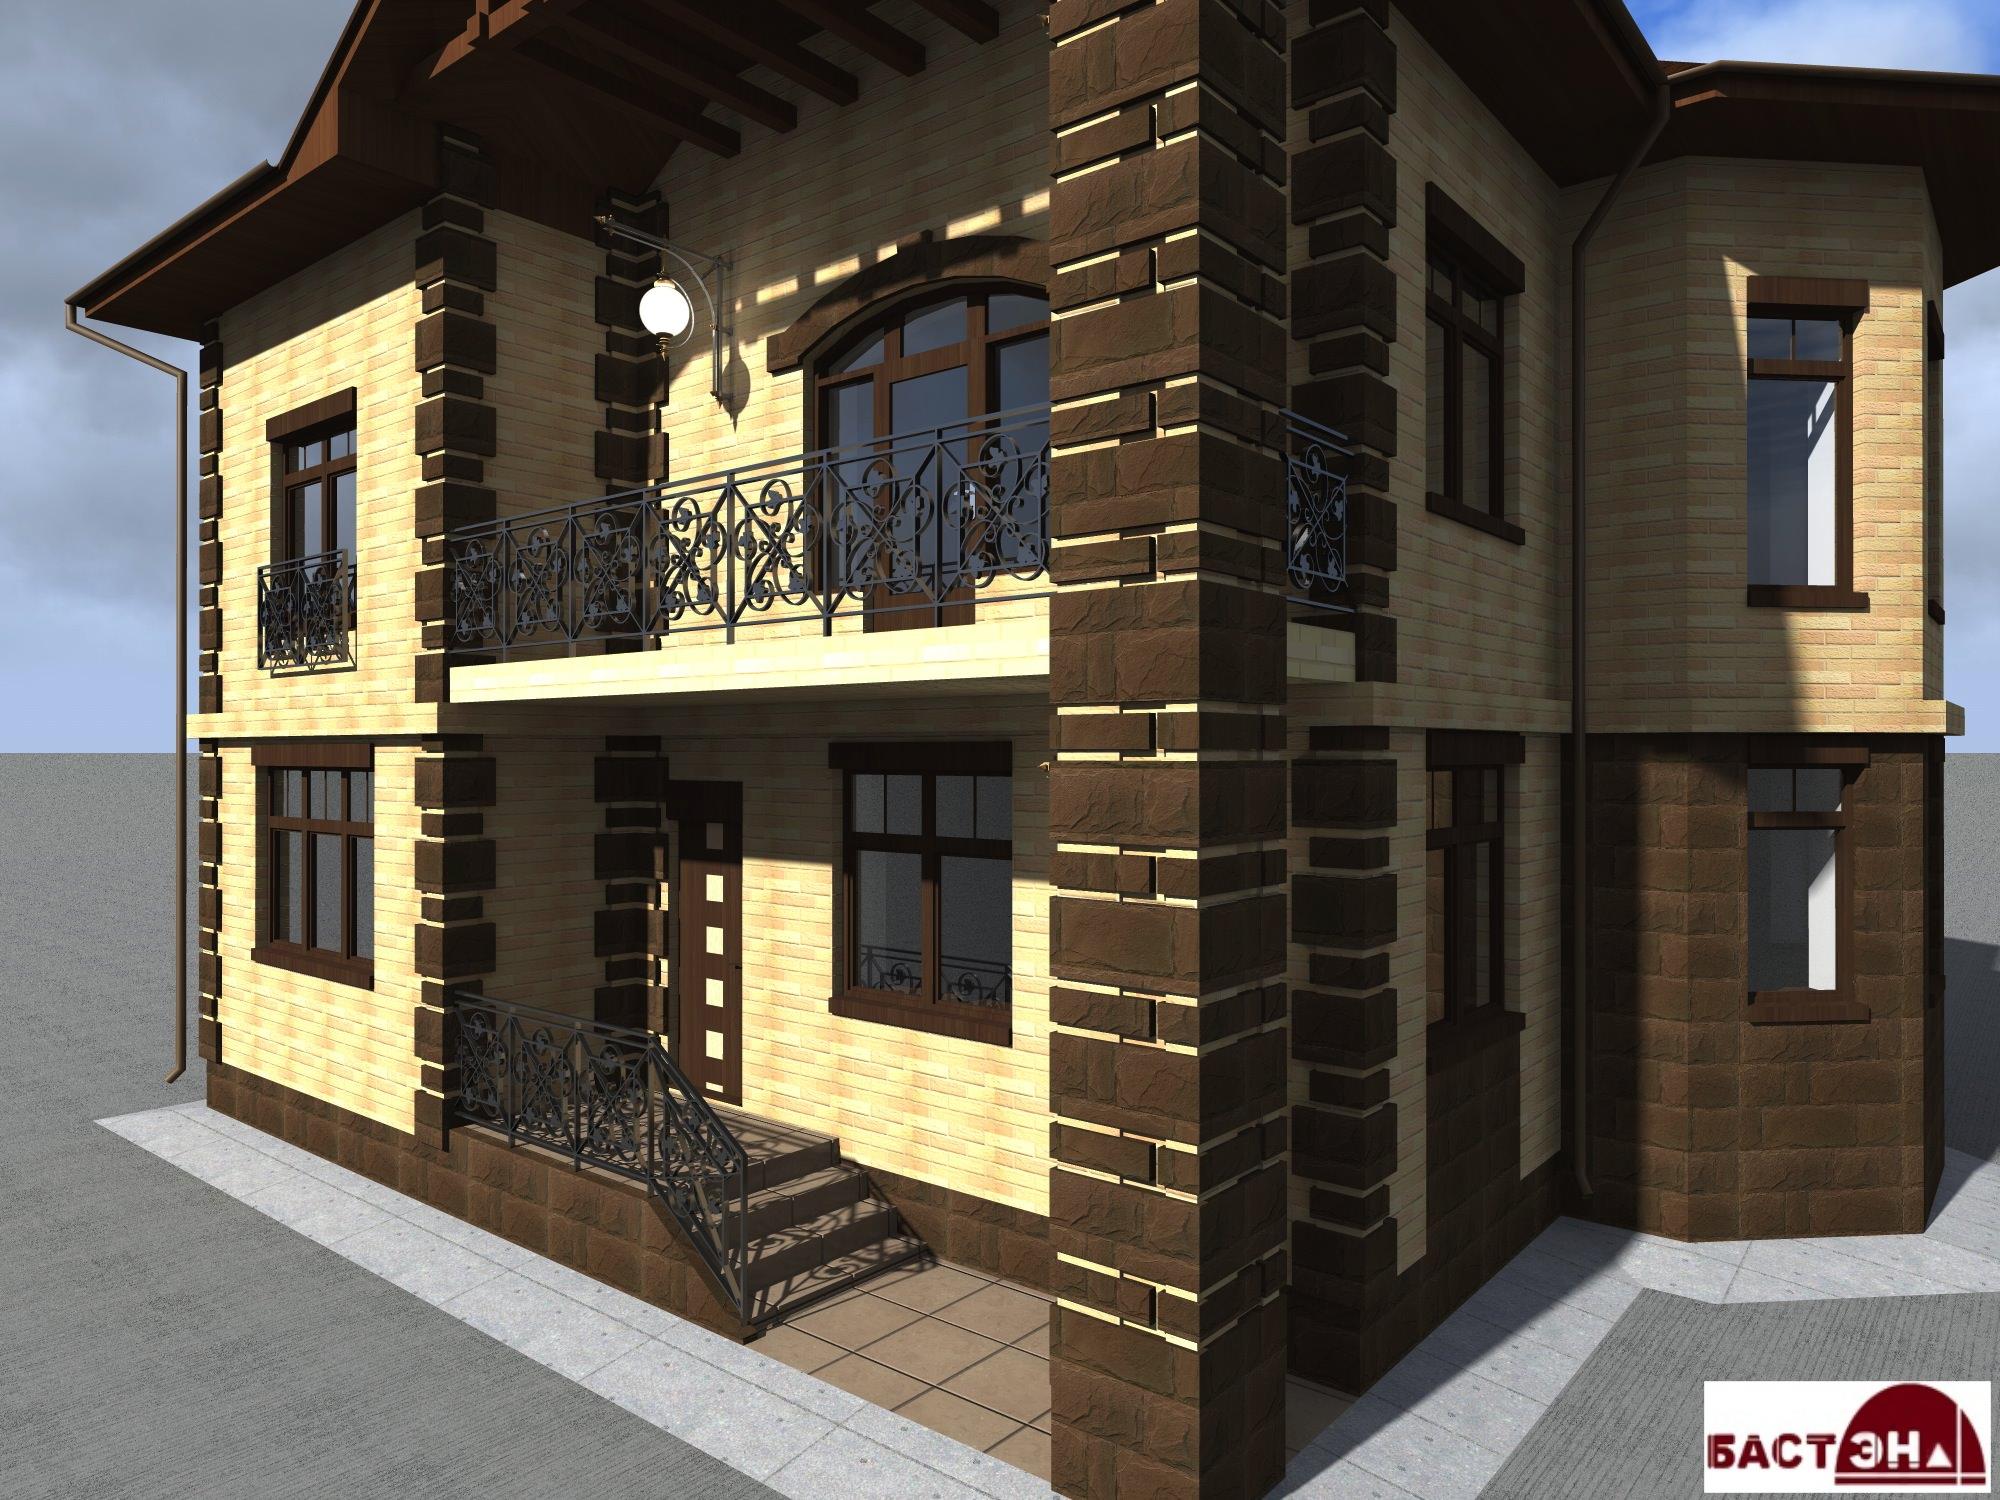 vid-7-individualnyj-dizajn-fasada-tipovogo-proekta-53-31.jpg